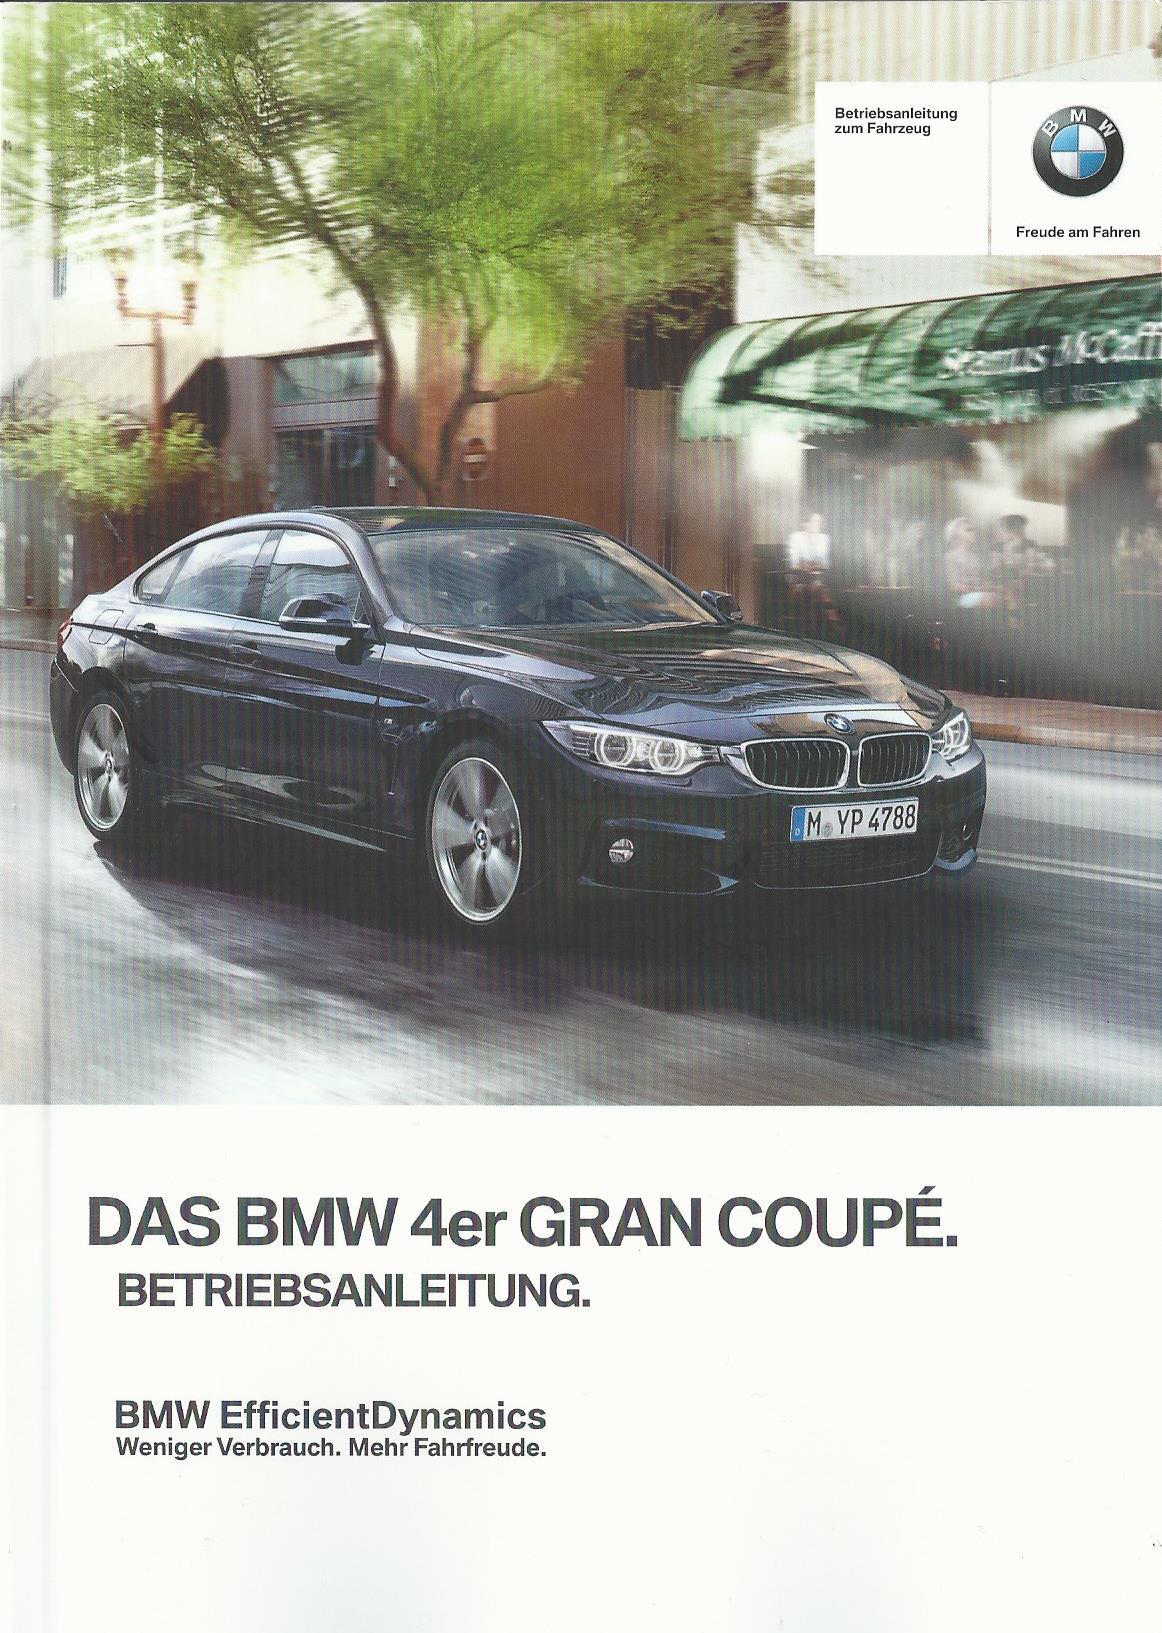 bmw 4er gran coupe betriebsanleitung 2014 handbuch f36. Black Bedroom Furniture Sets. Home Design Ideas